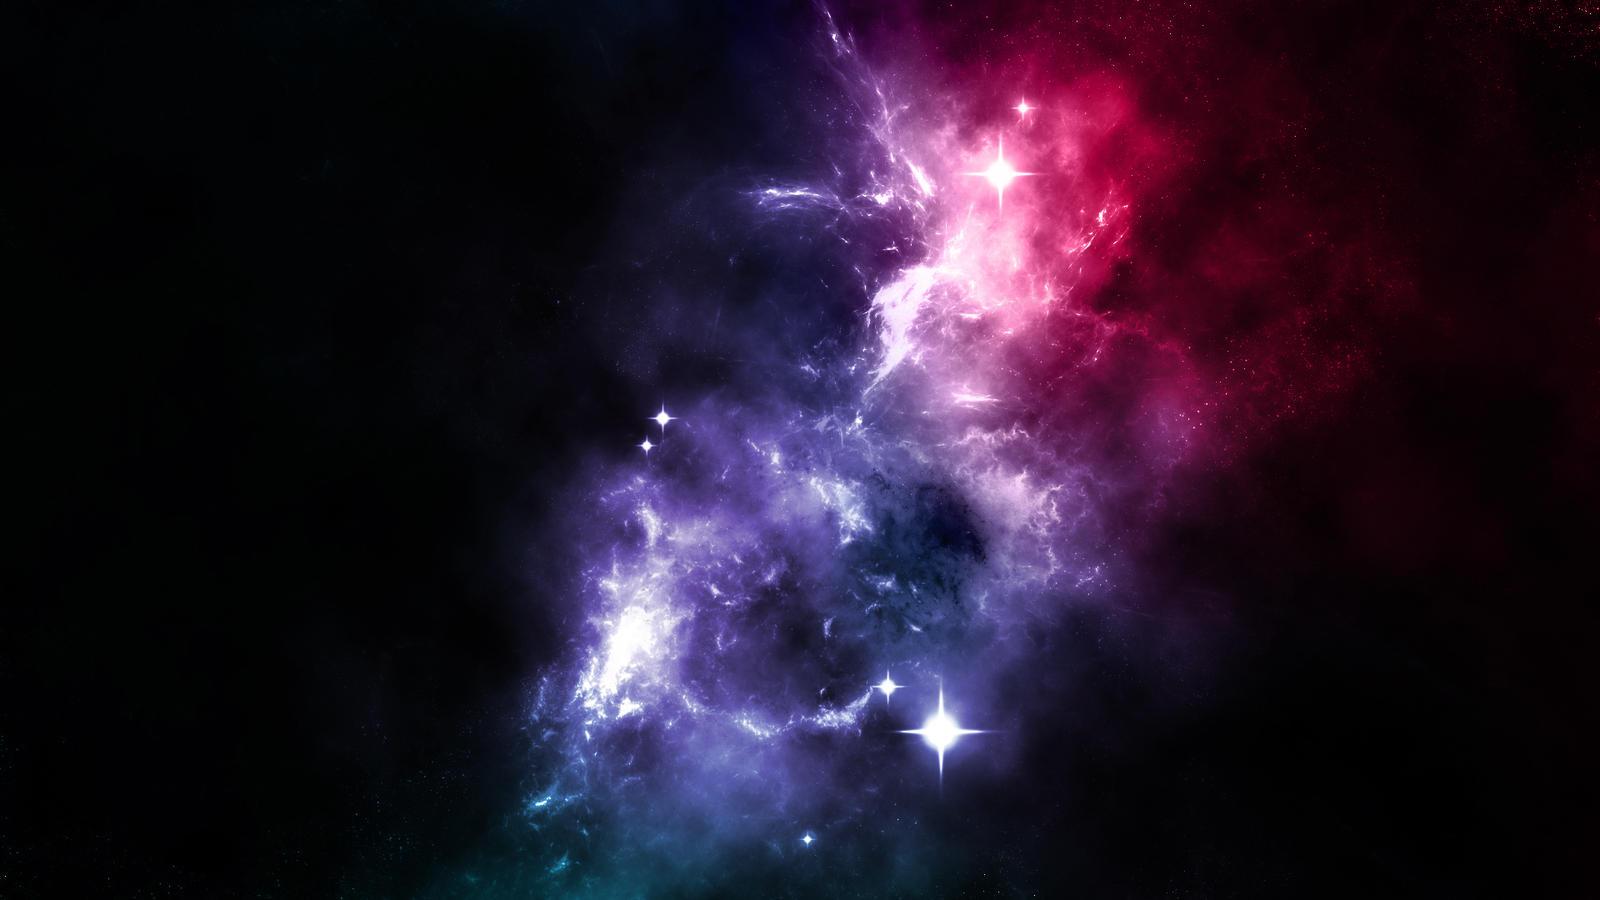 Nebula Texture Stock 002